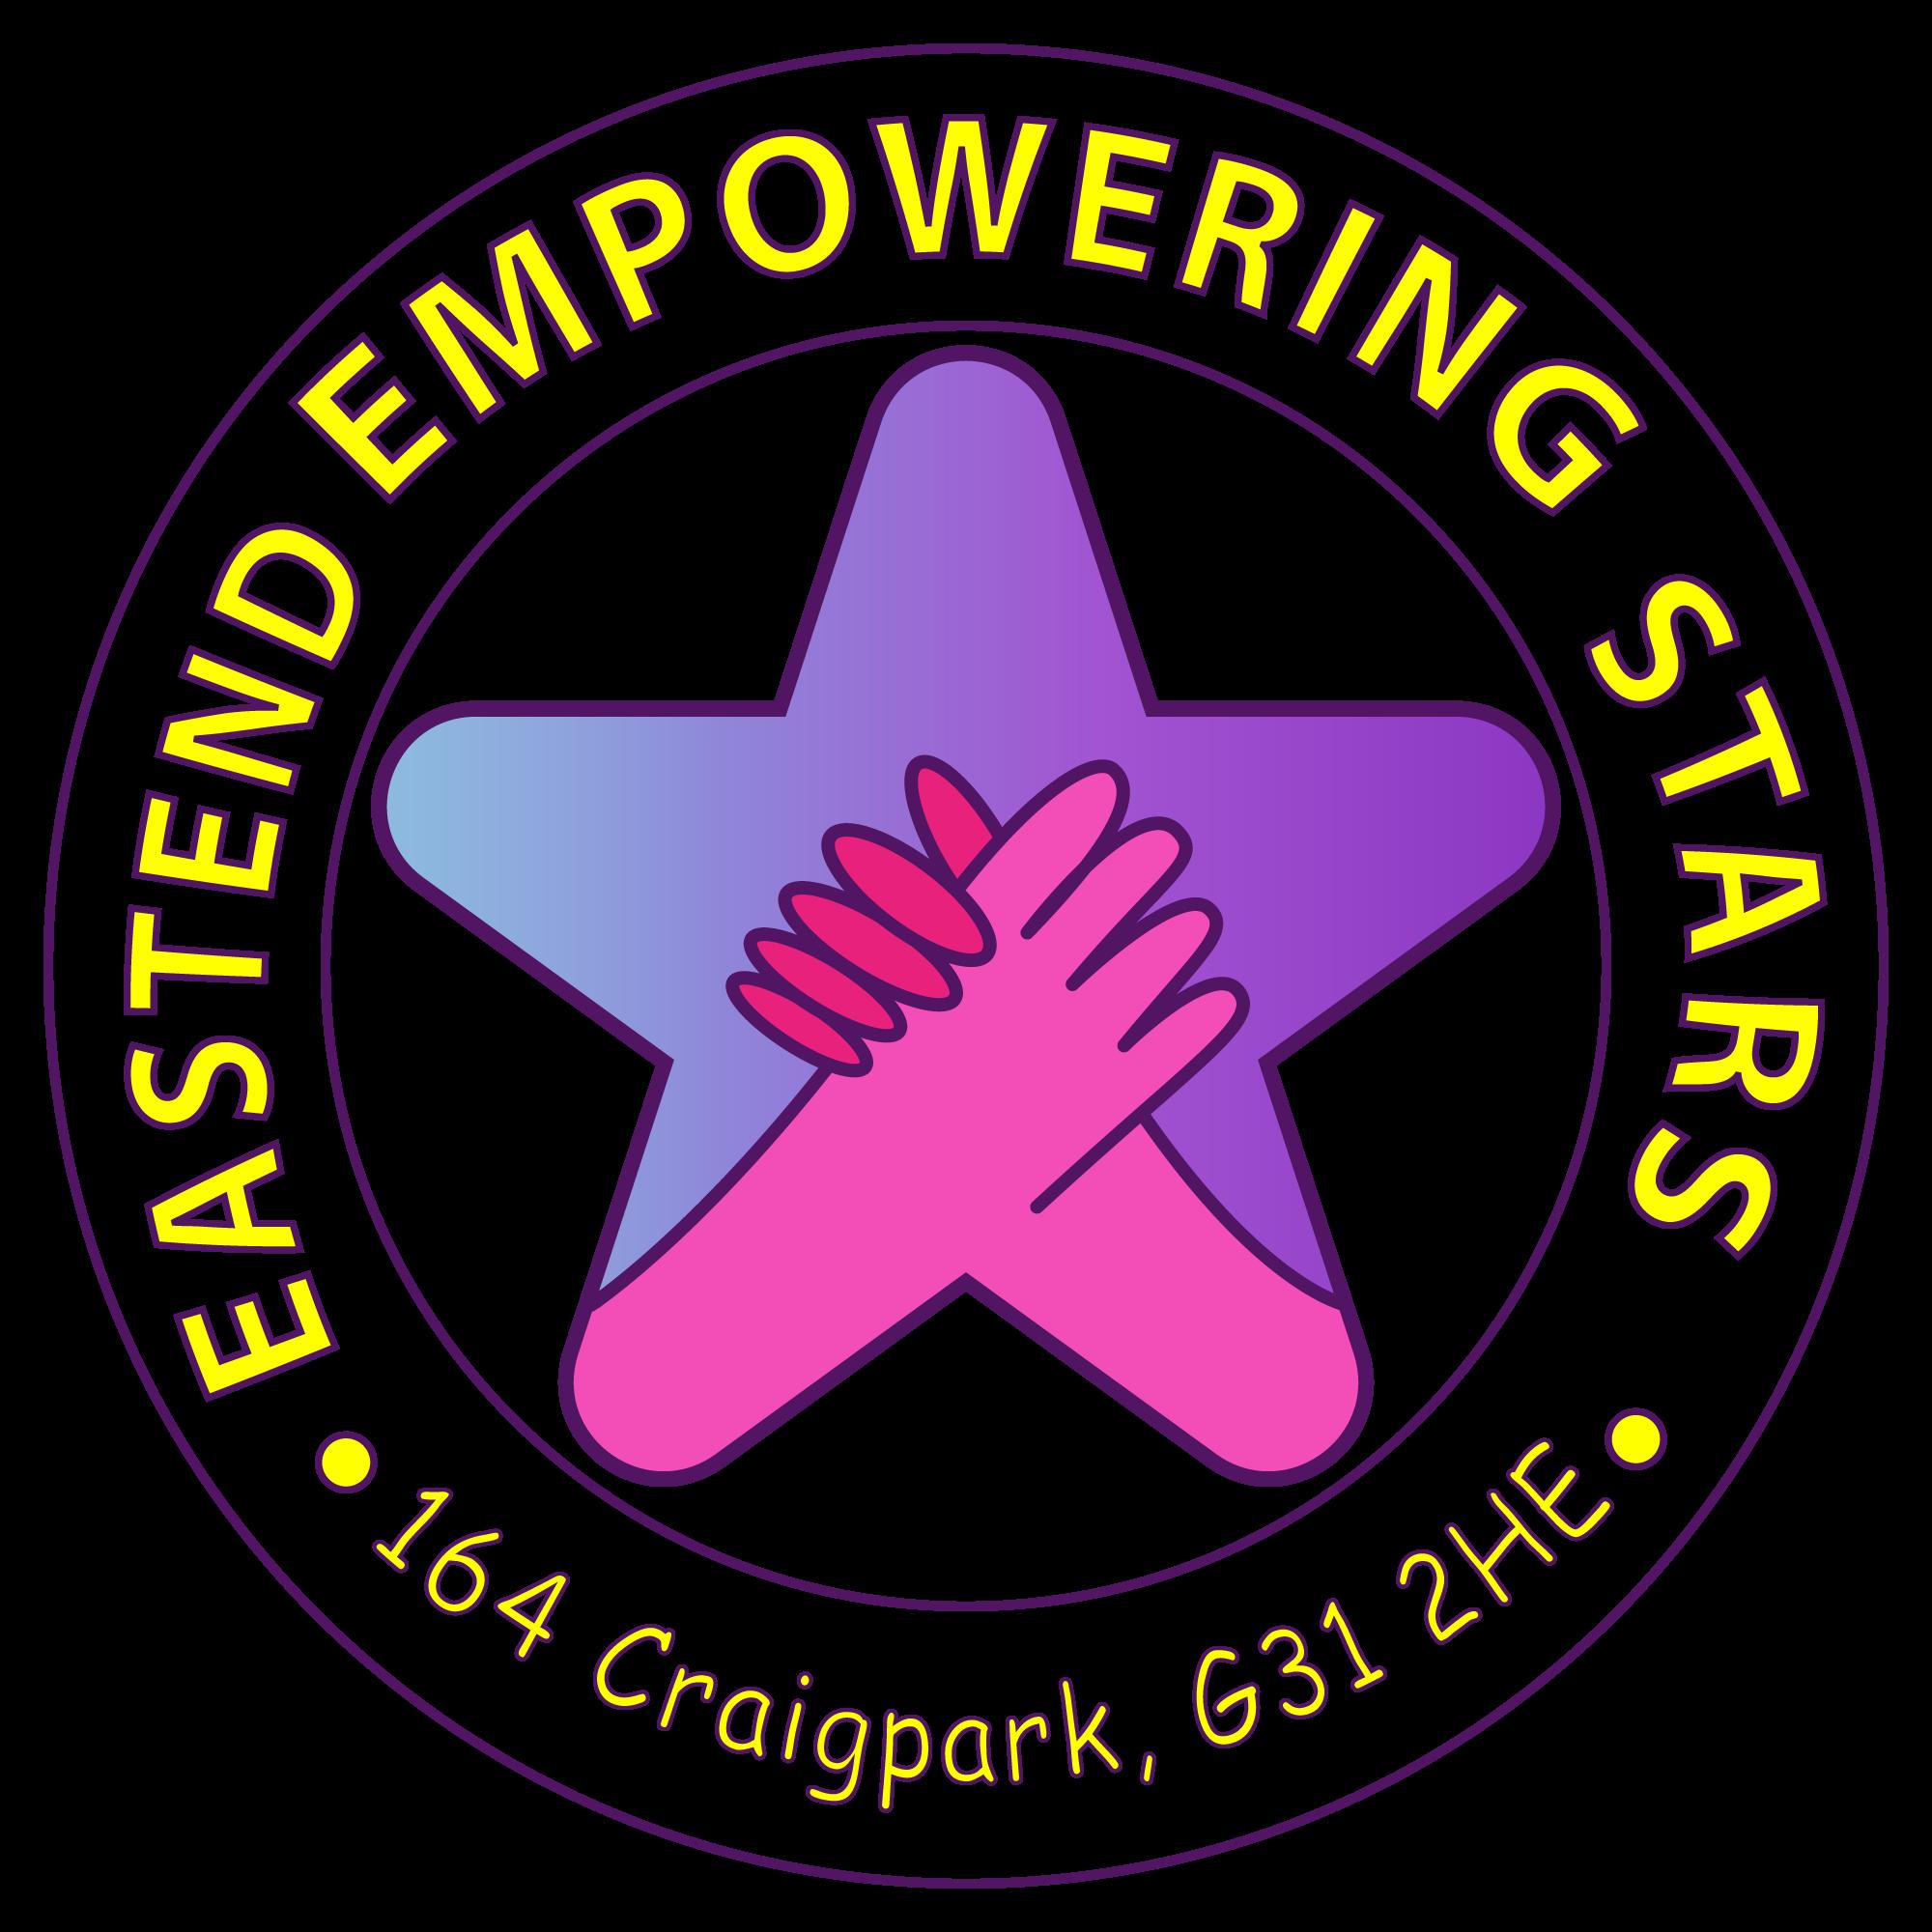 Eastend Empowering Stars